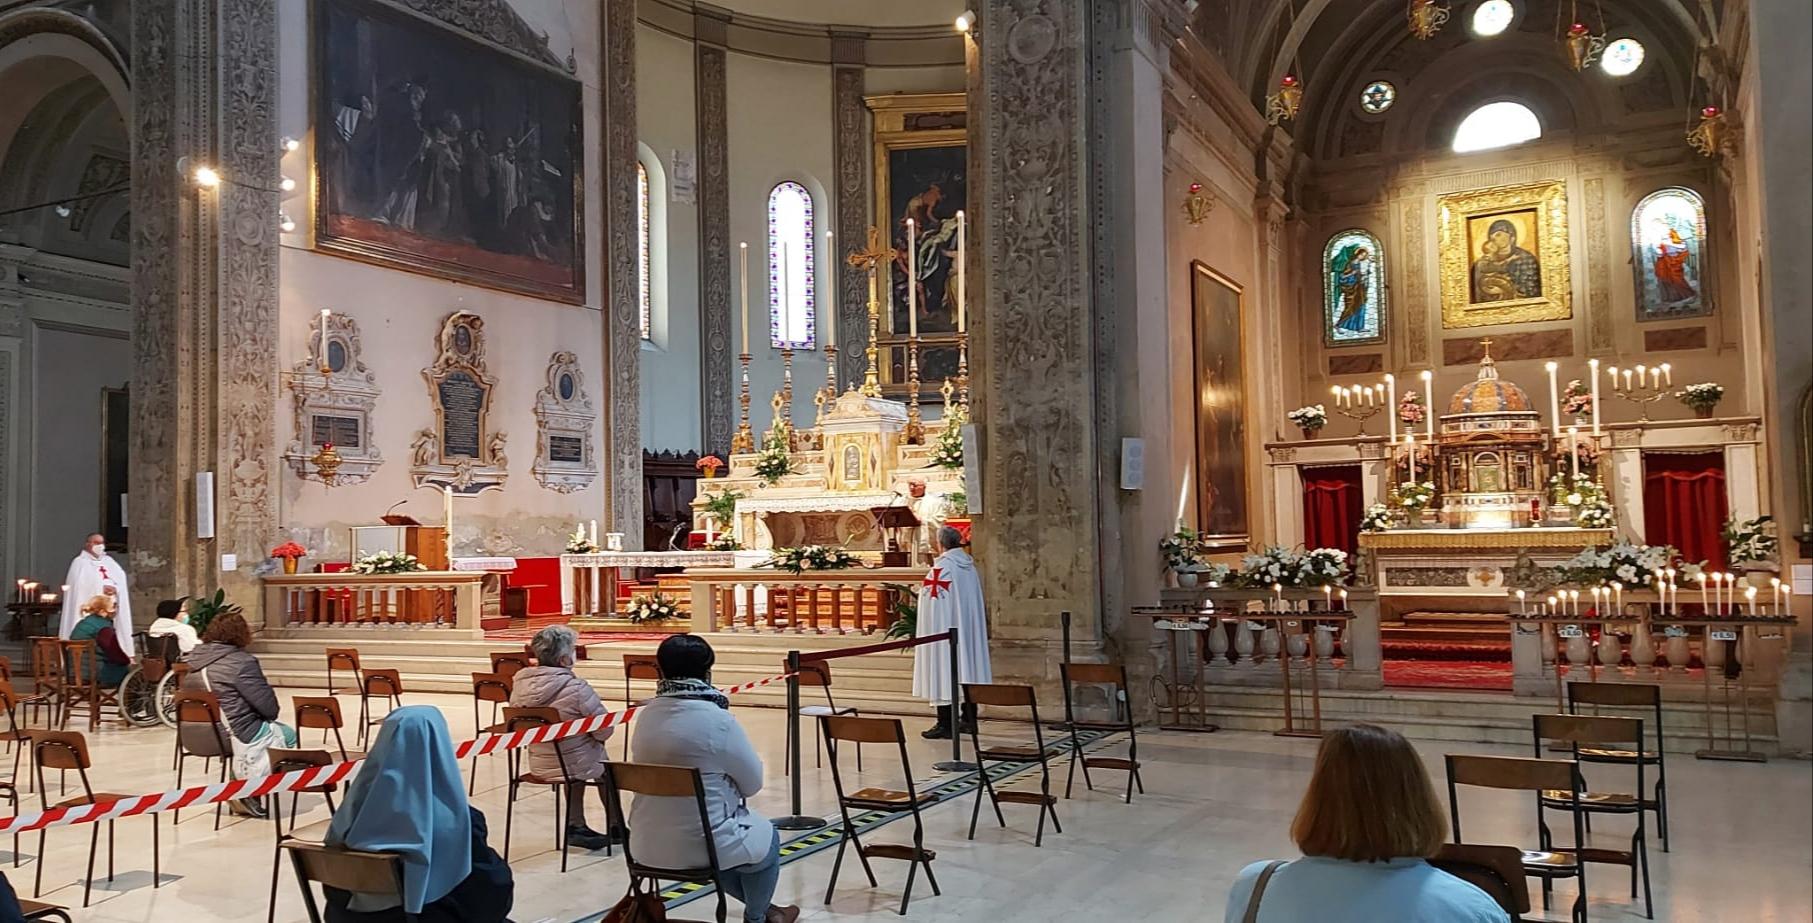 Turno di Custodia  Santa Messa – Basilica di San Francesco a Ferrara 05.04.2021